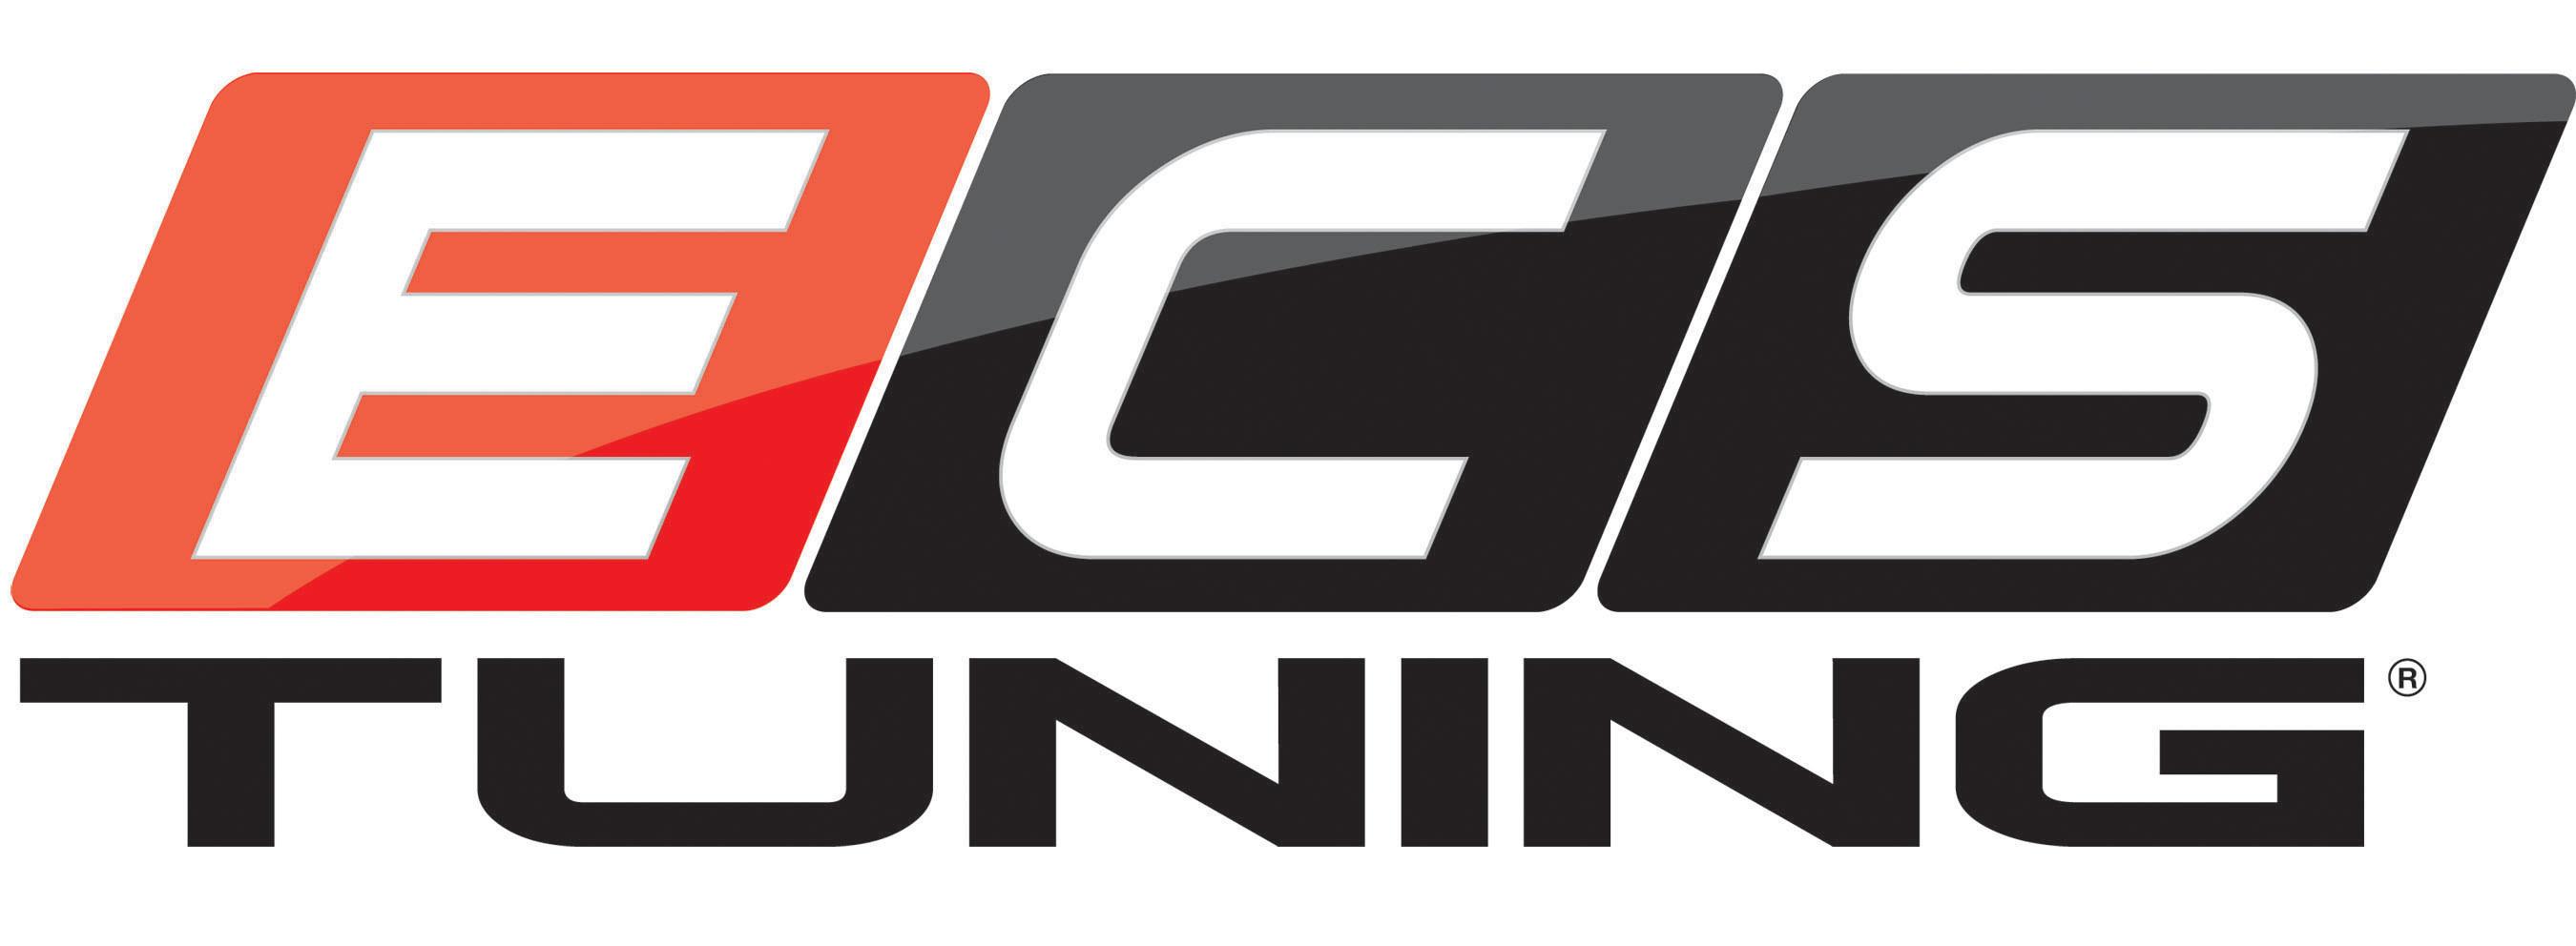 ECS Tuning Announces Acquisition of Turner Motorsport